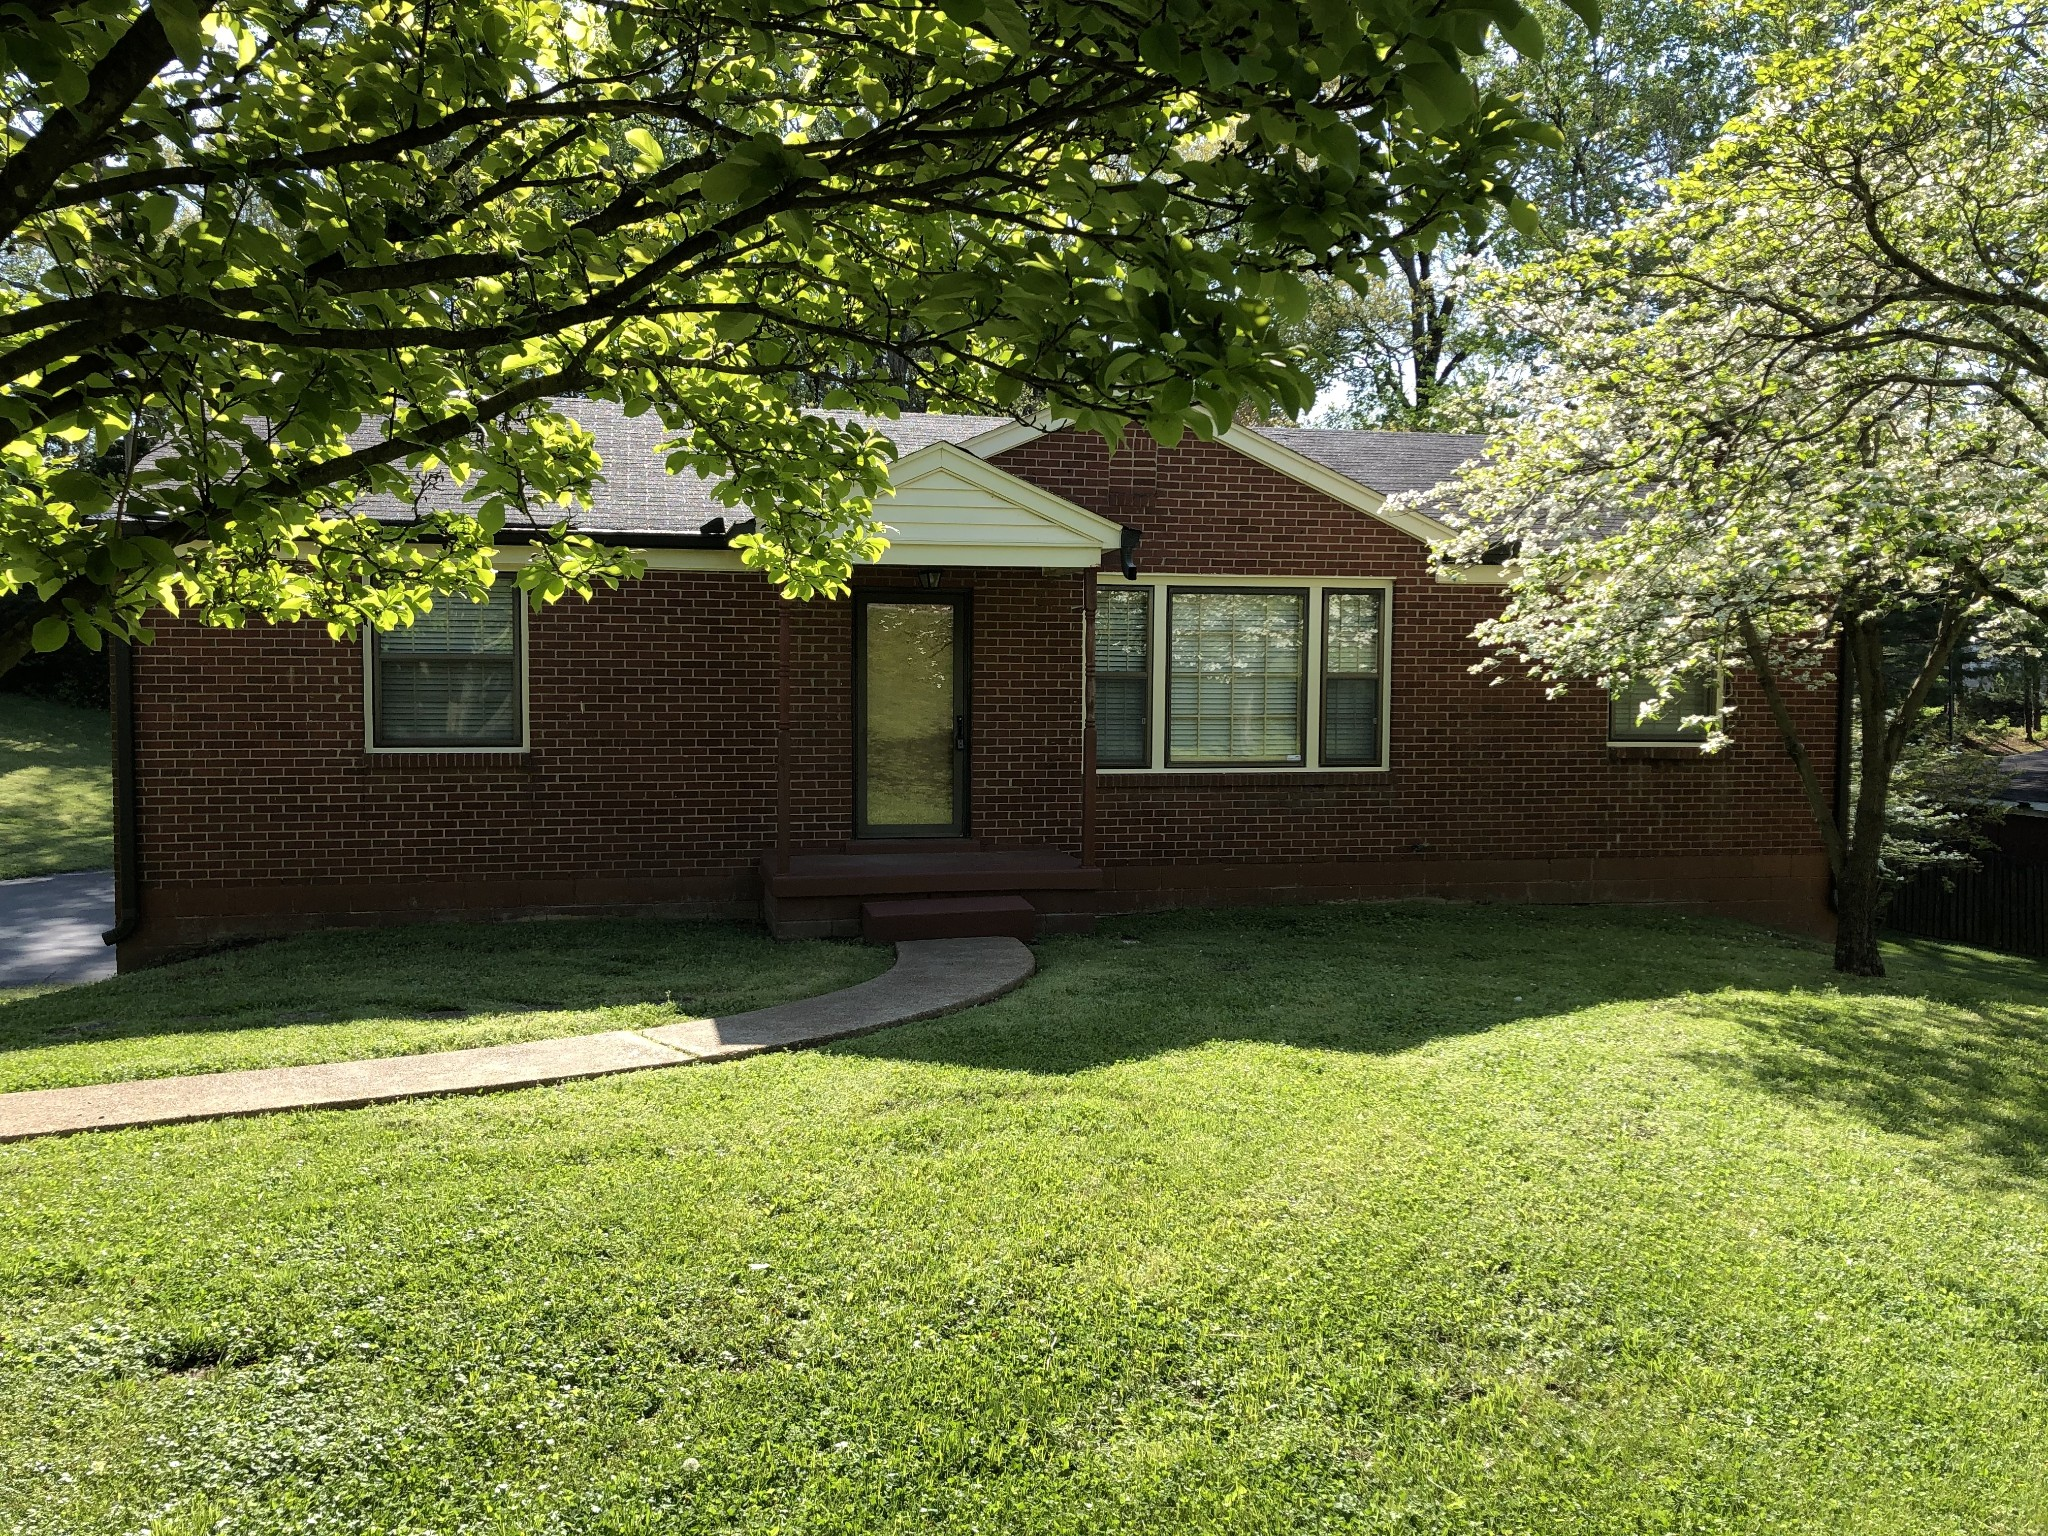 319 Emery Dr, Nashville, TN 37214 - Nashville, TN real estate listing